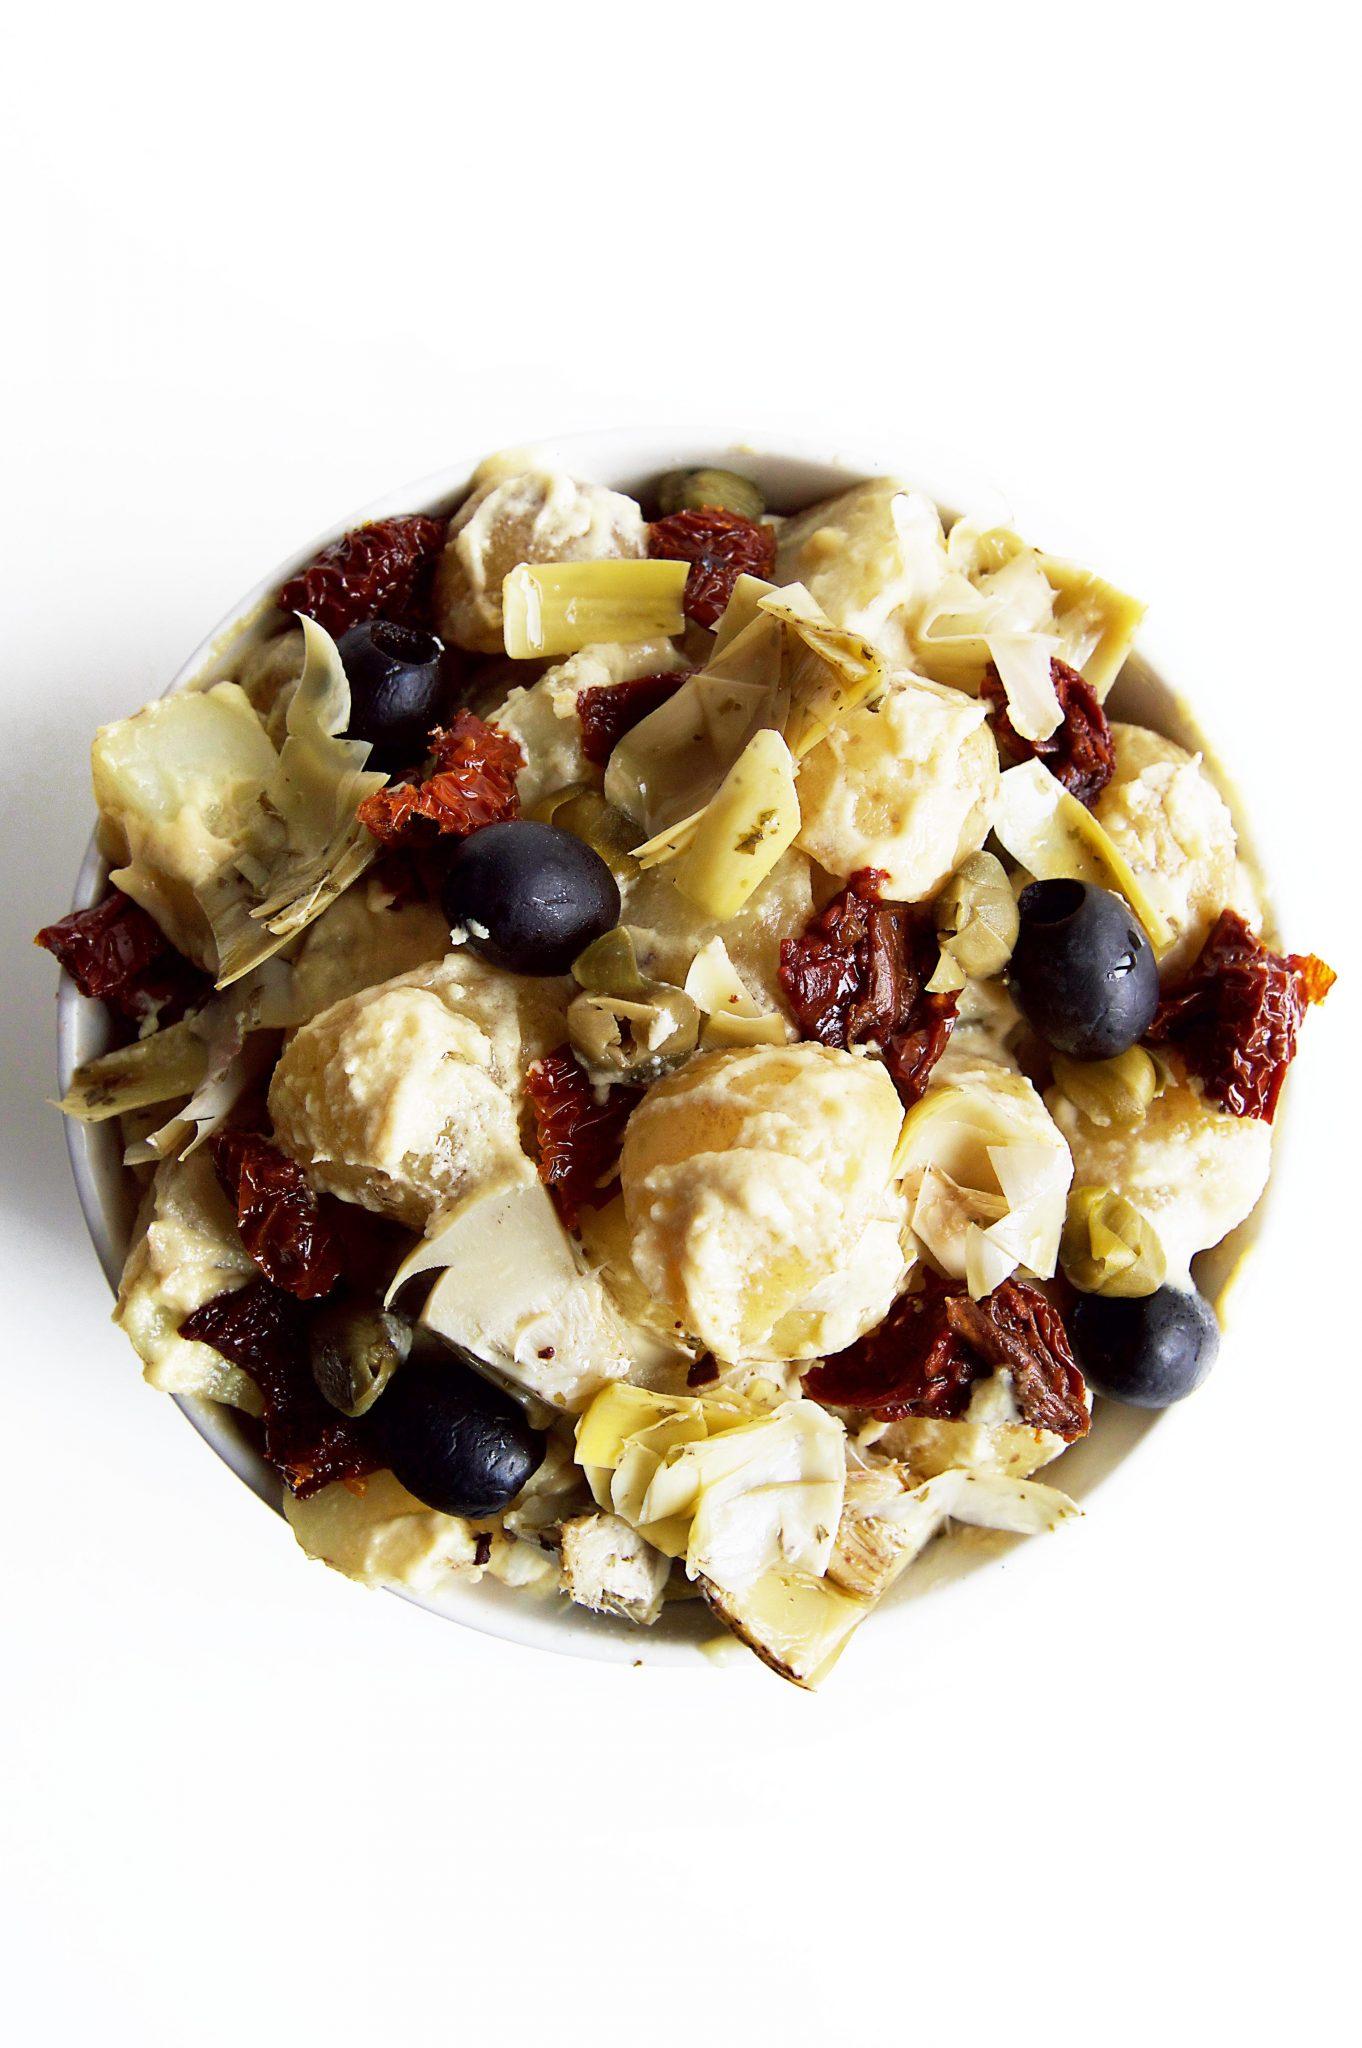 Vegan Baby Potato Salad With Tahini Dijon Mustard Dressing (AKA The Best Damn Potato Salad)